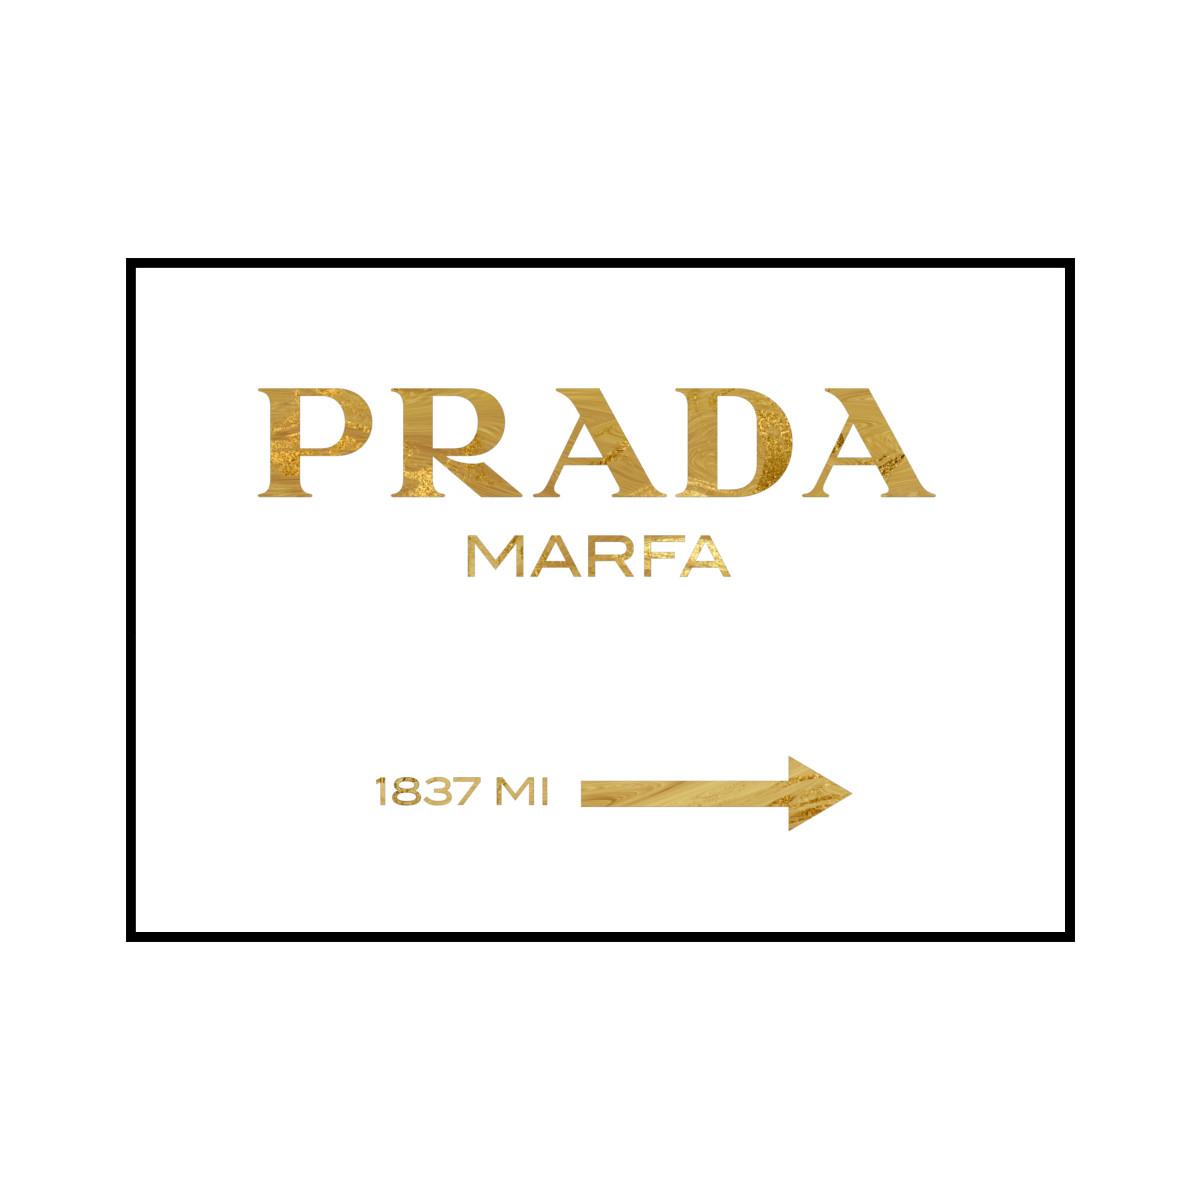 """PRADA MARFA 1837 MI"" Gold marble - POSTER [SD-000563] A4サイズ ポスター単品"